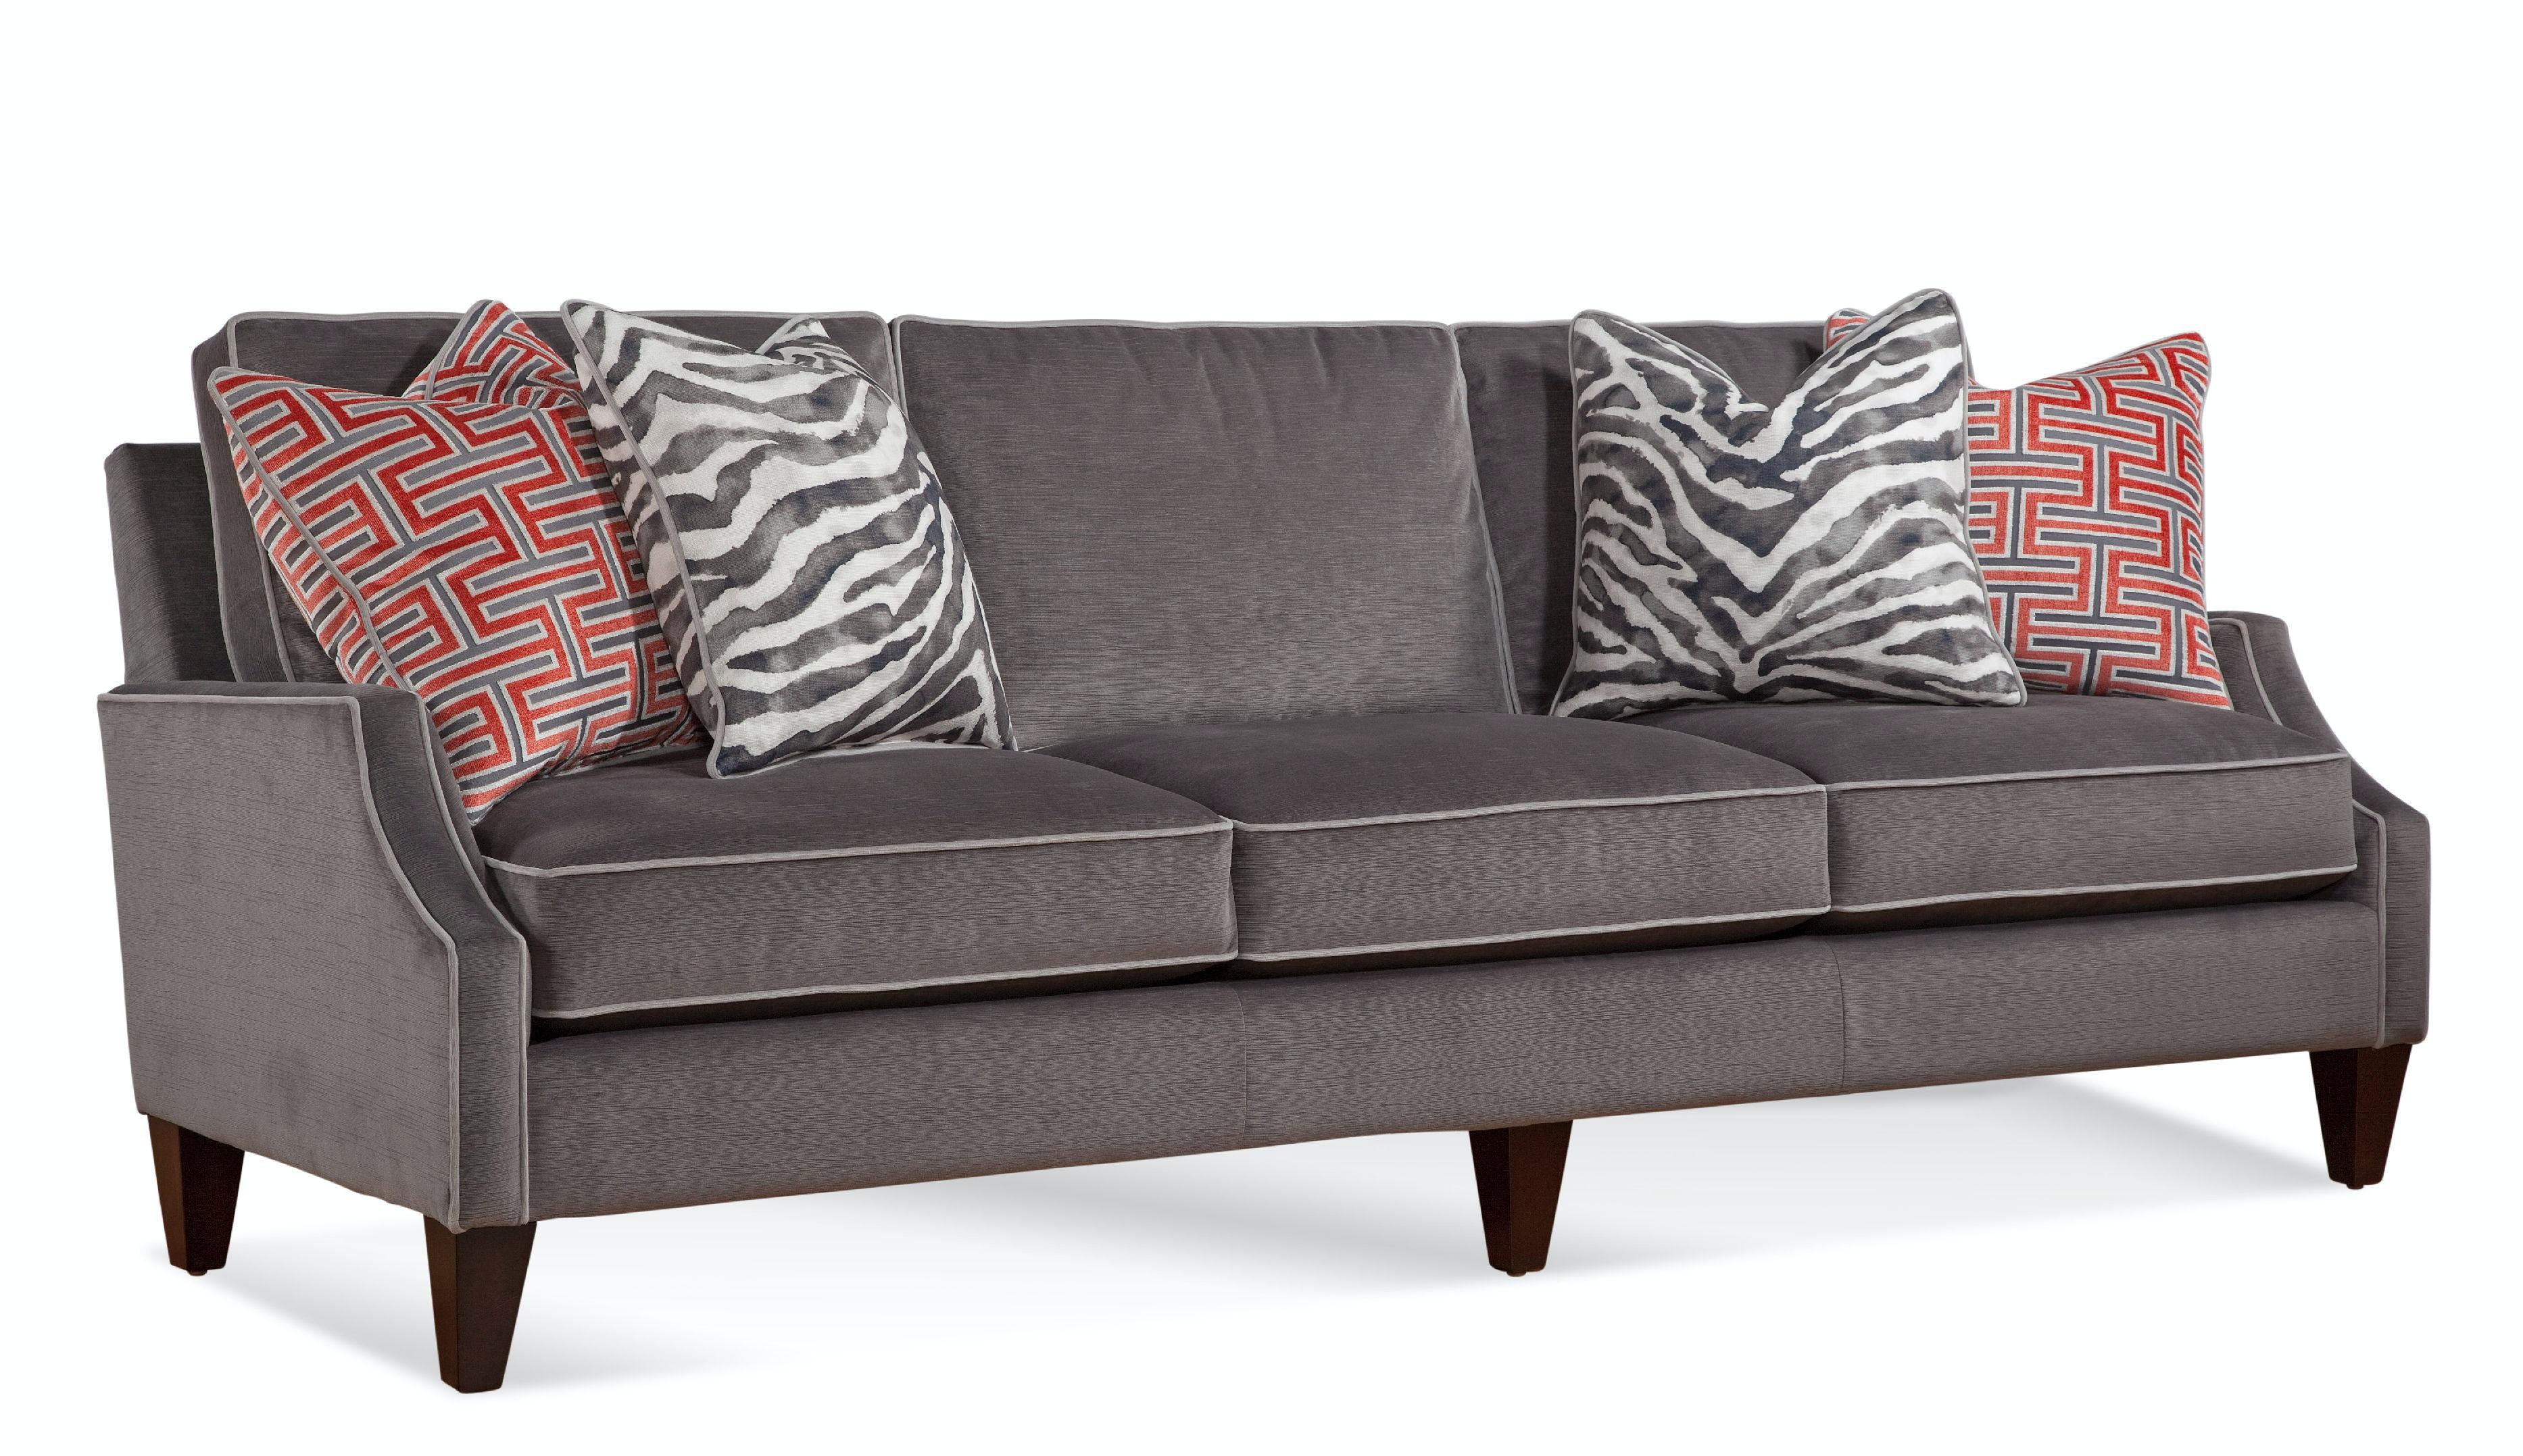 A612 042. Sofa